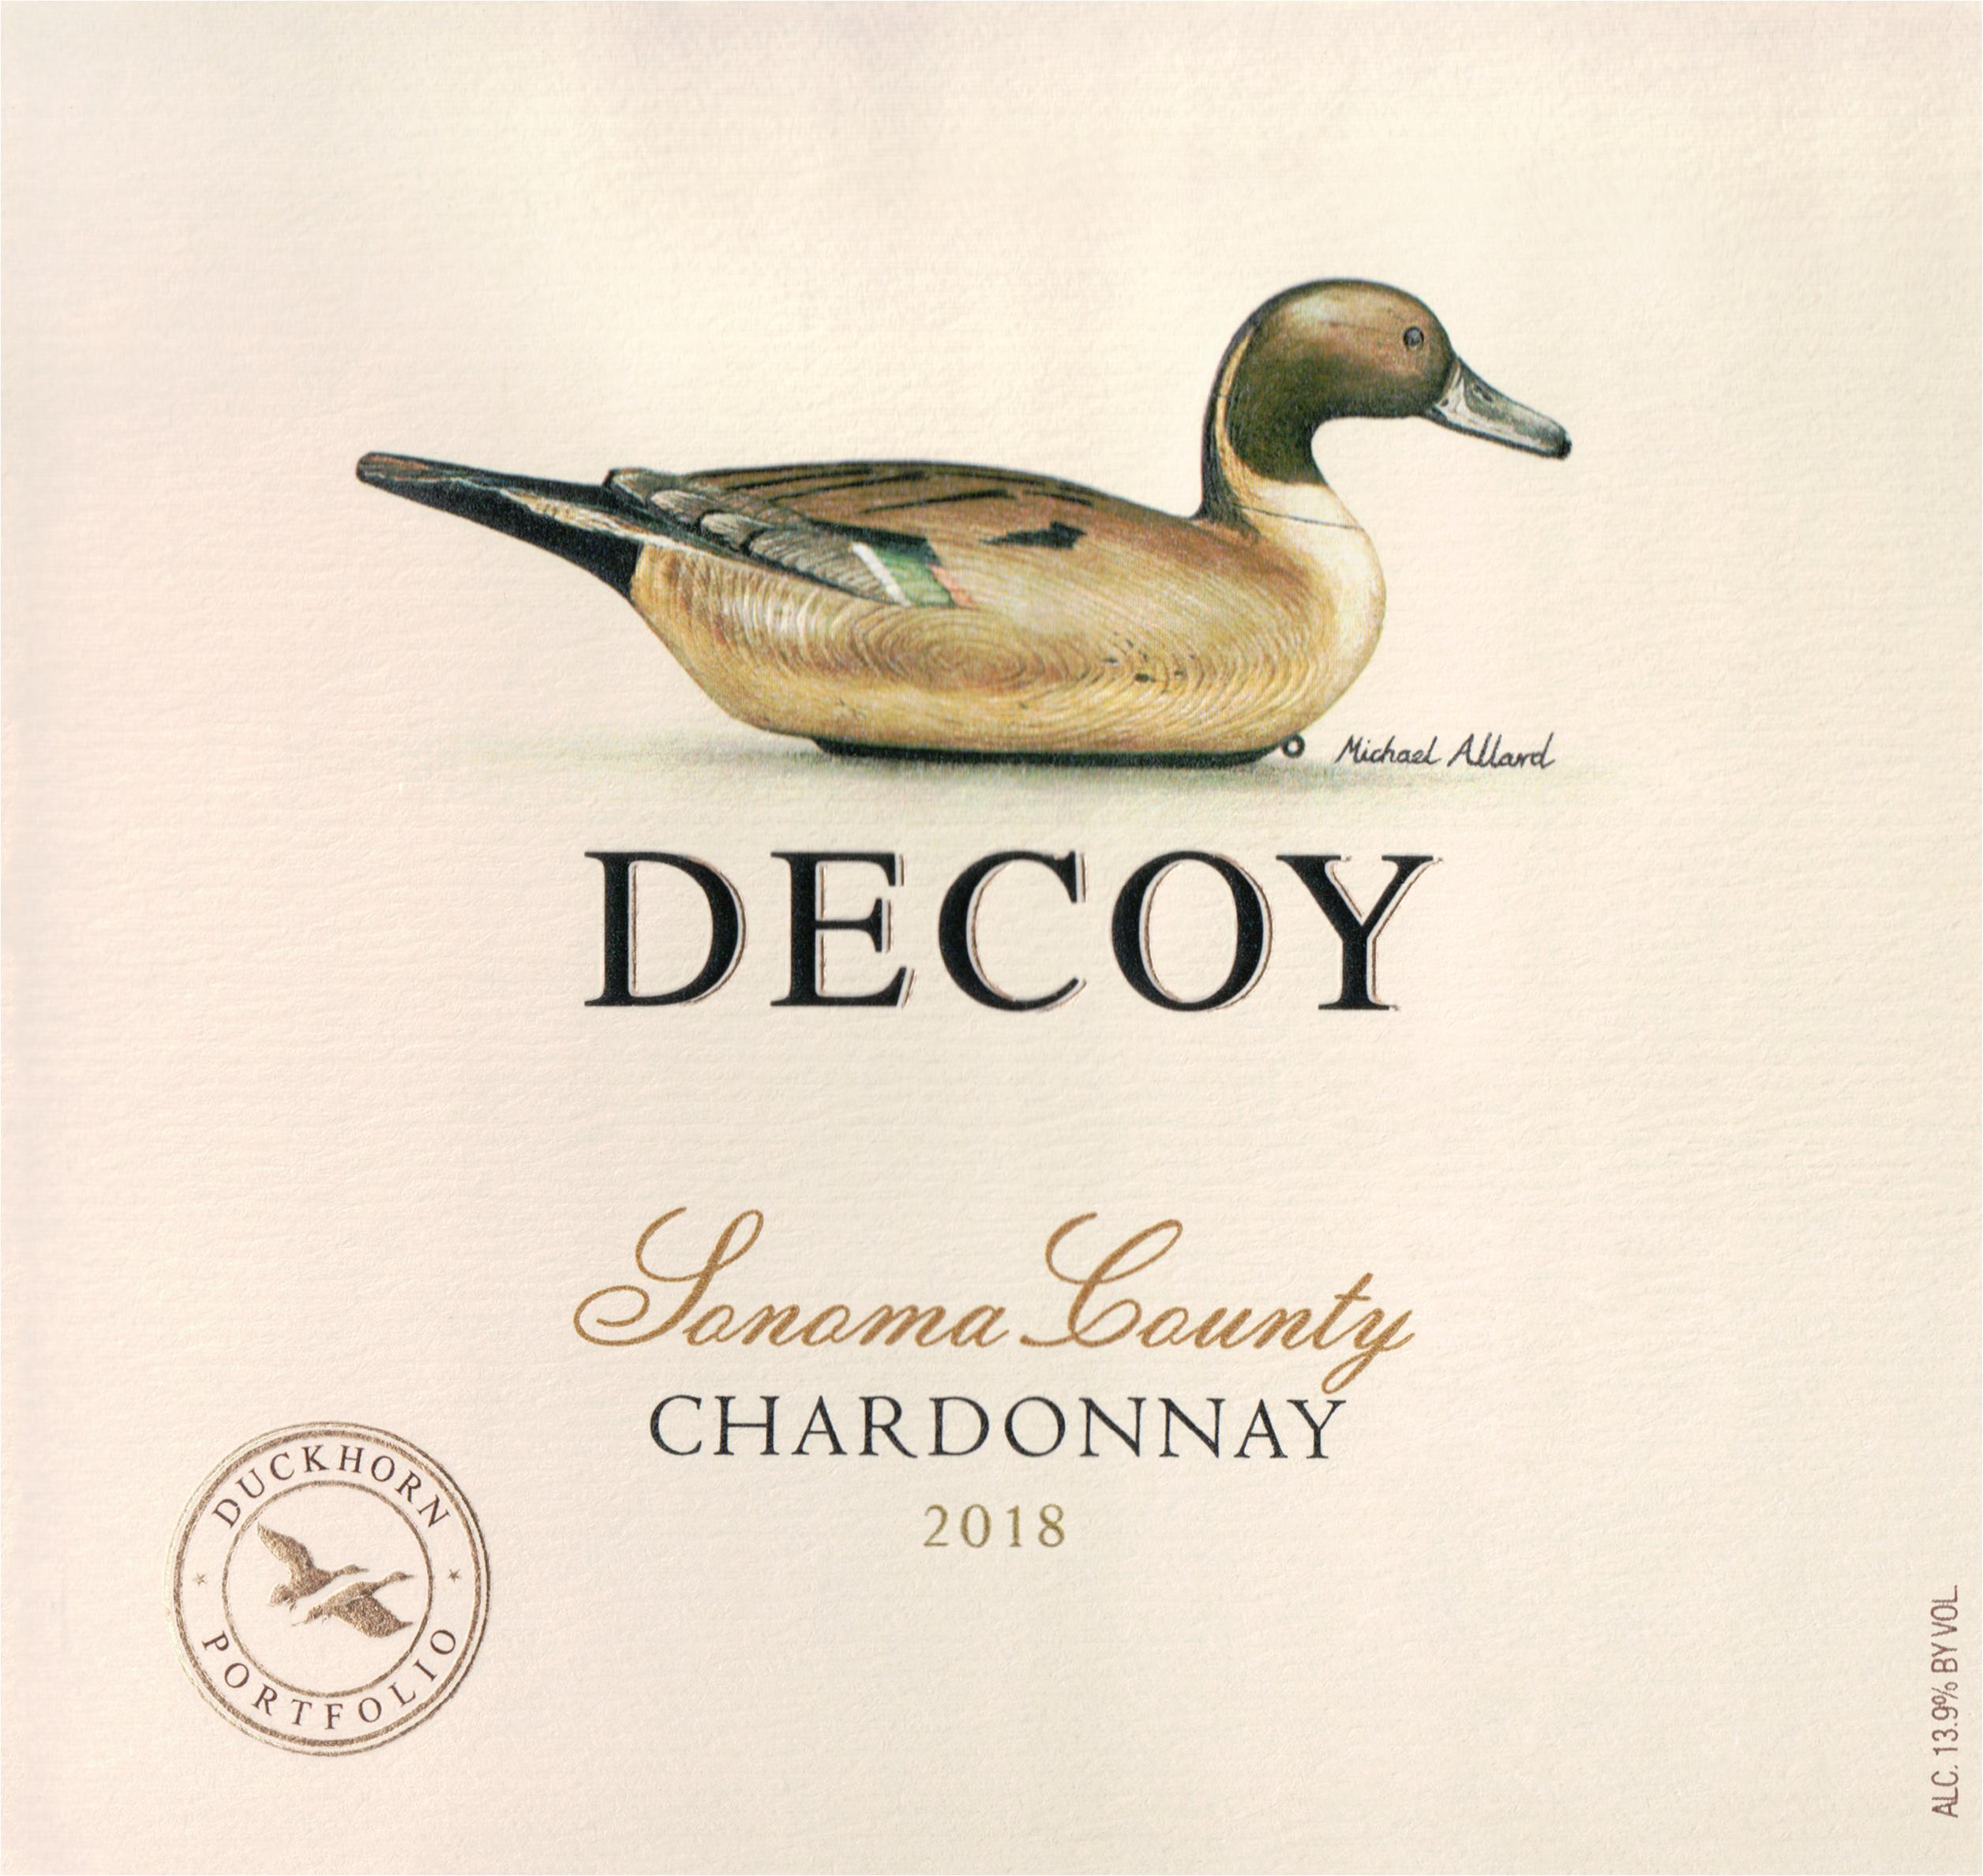 Duckhorn Decoy Chardonnay 2018